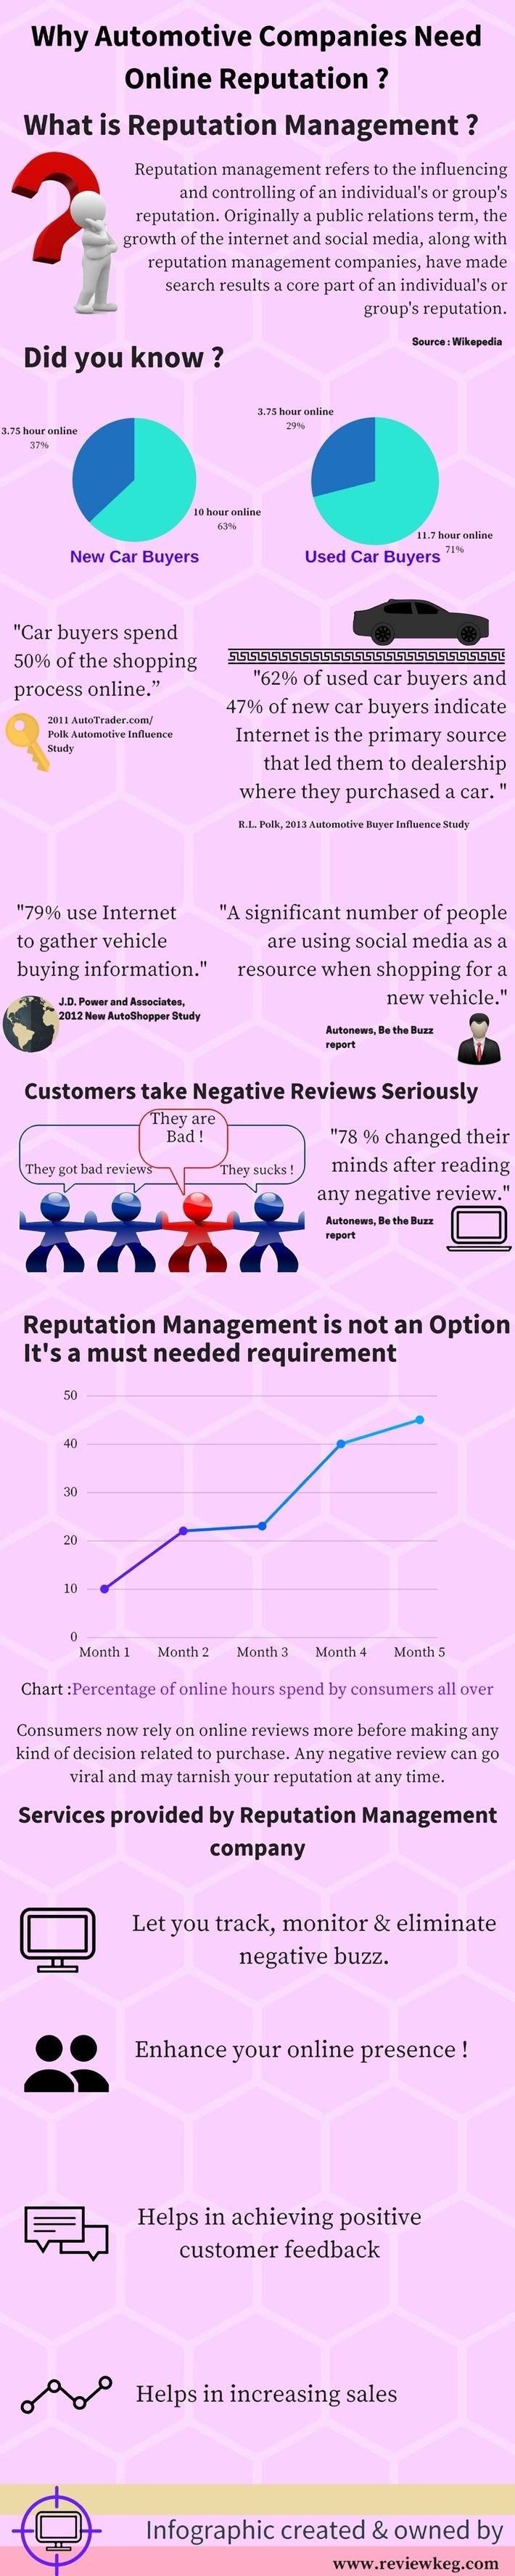 Why Automotive Enterprises Need Online Reputation Management